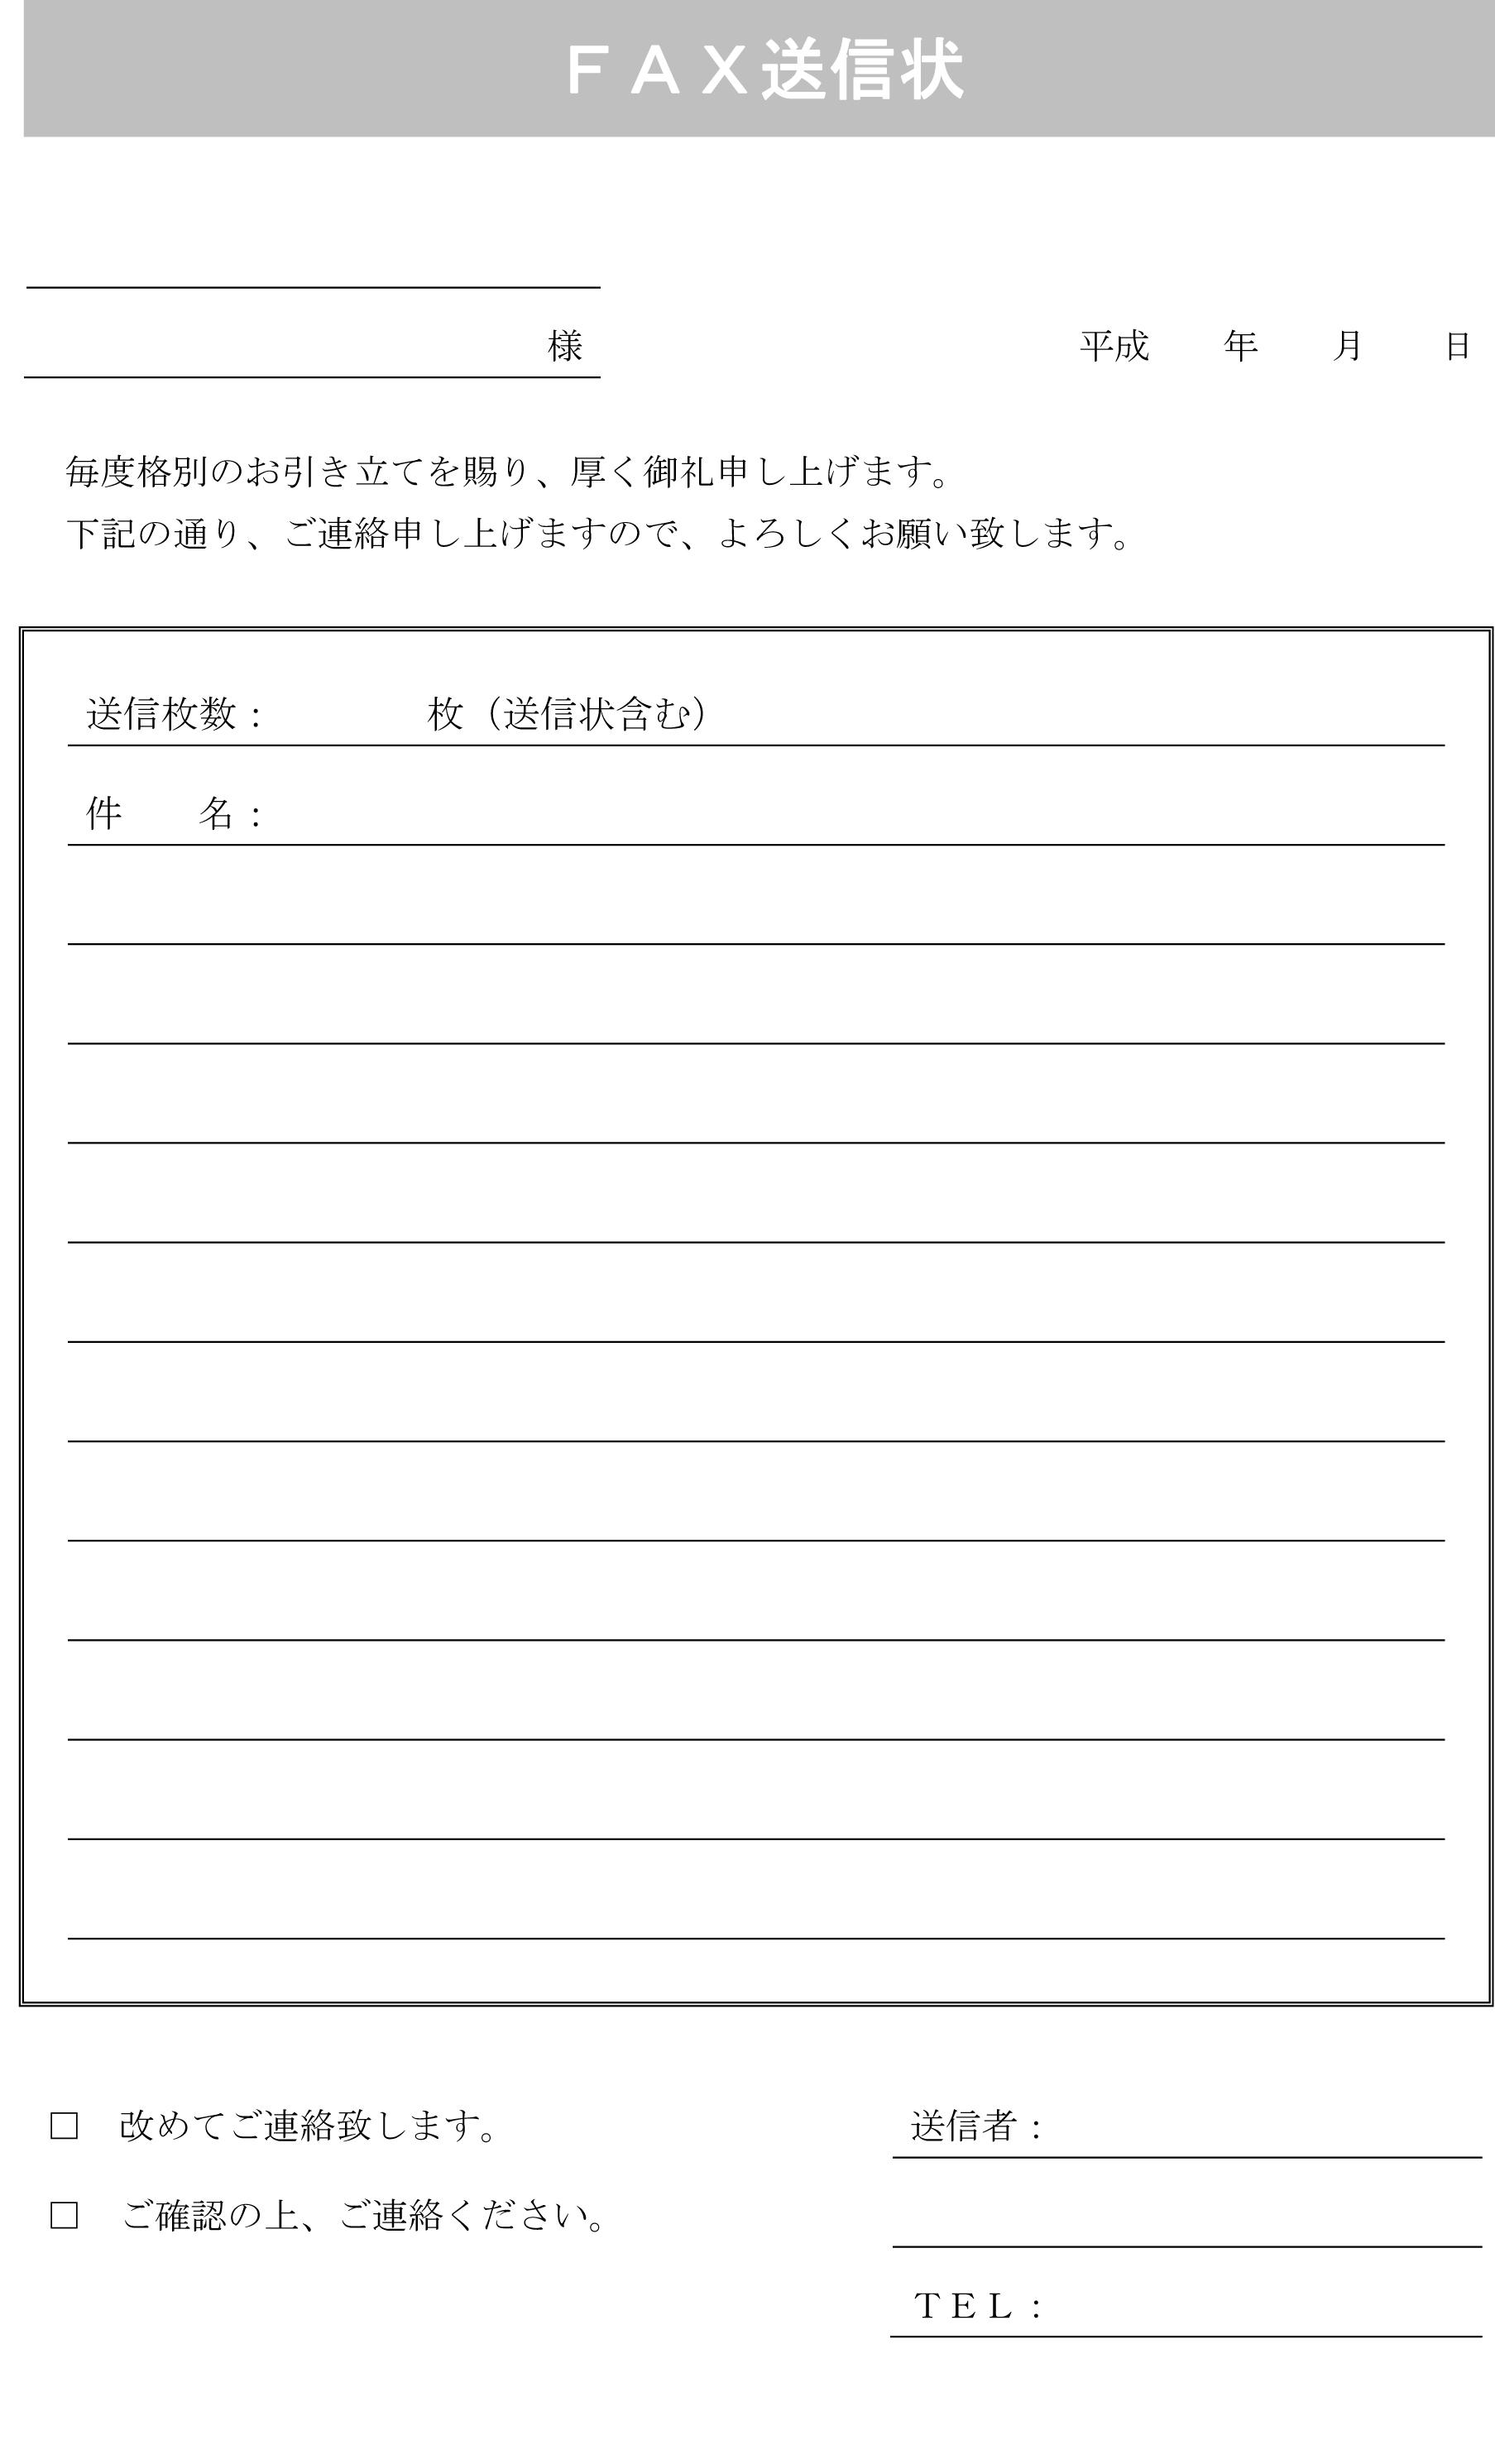 fax送信状_2